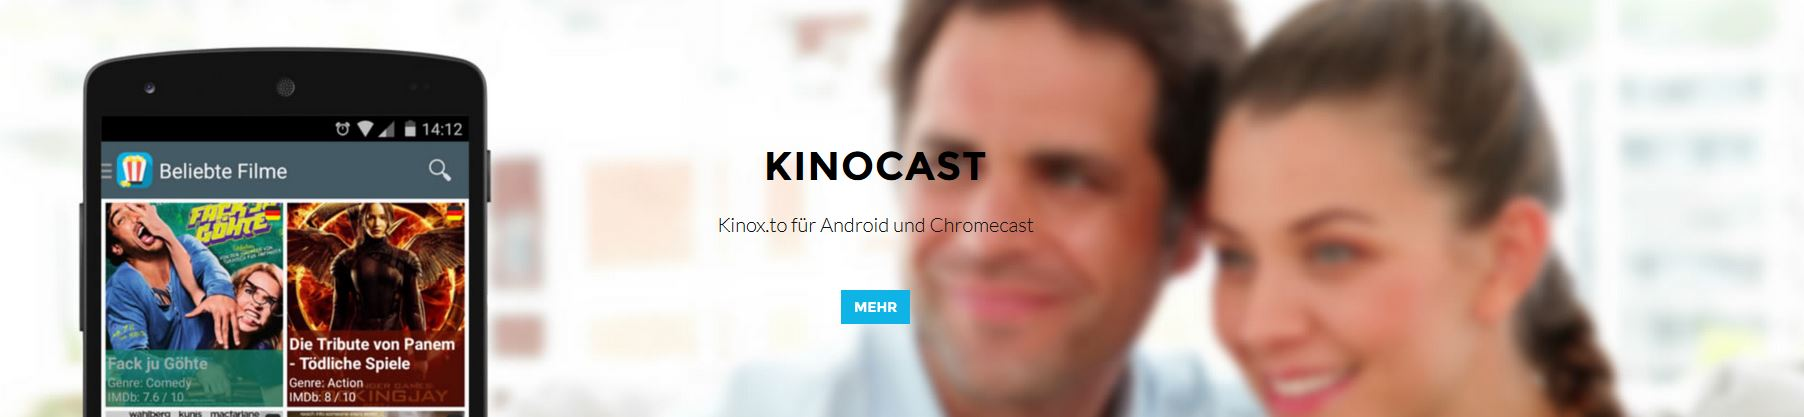 kinox app legal